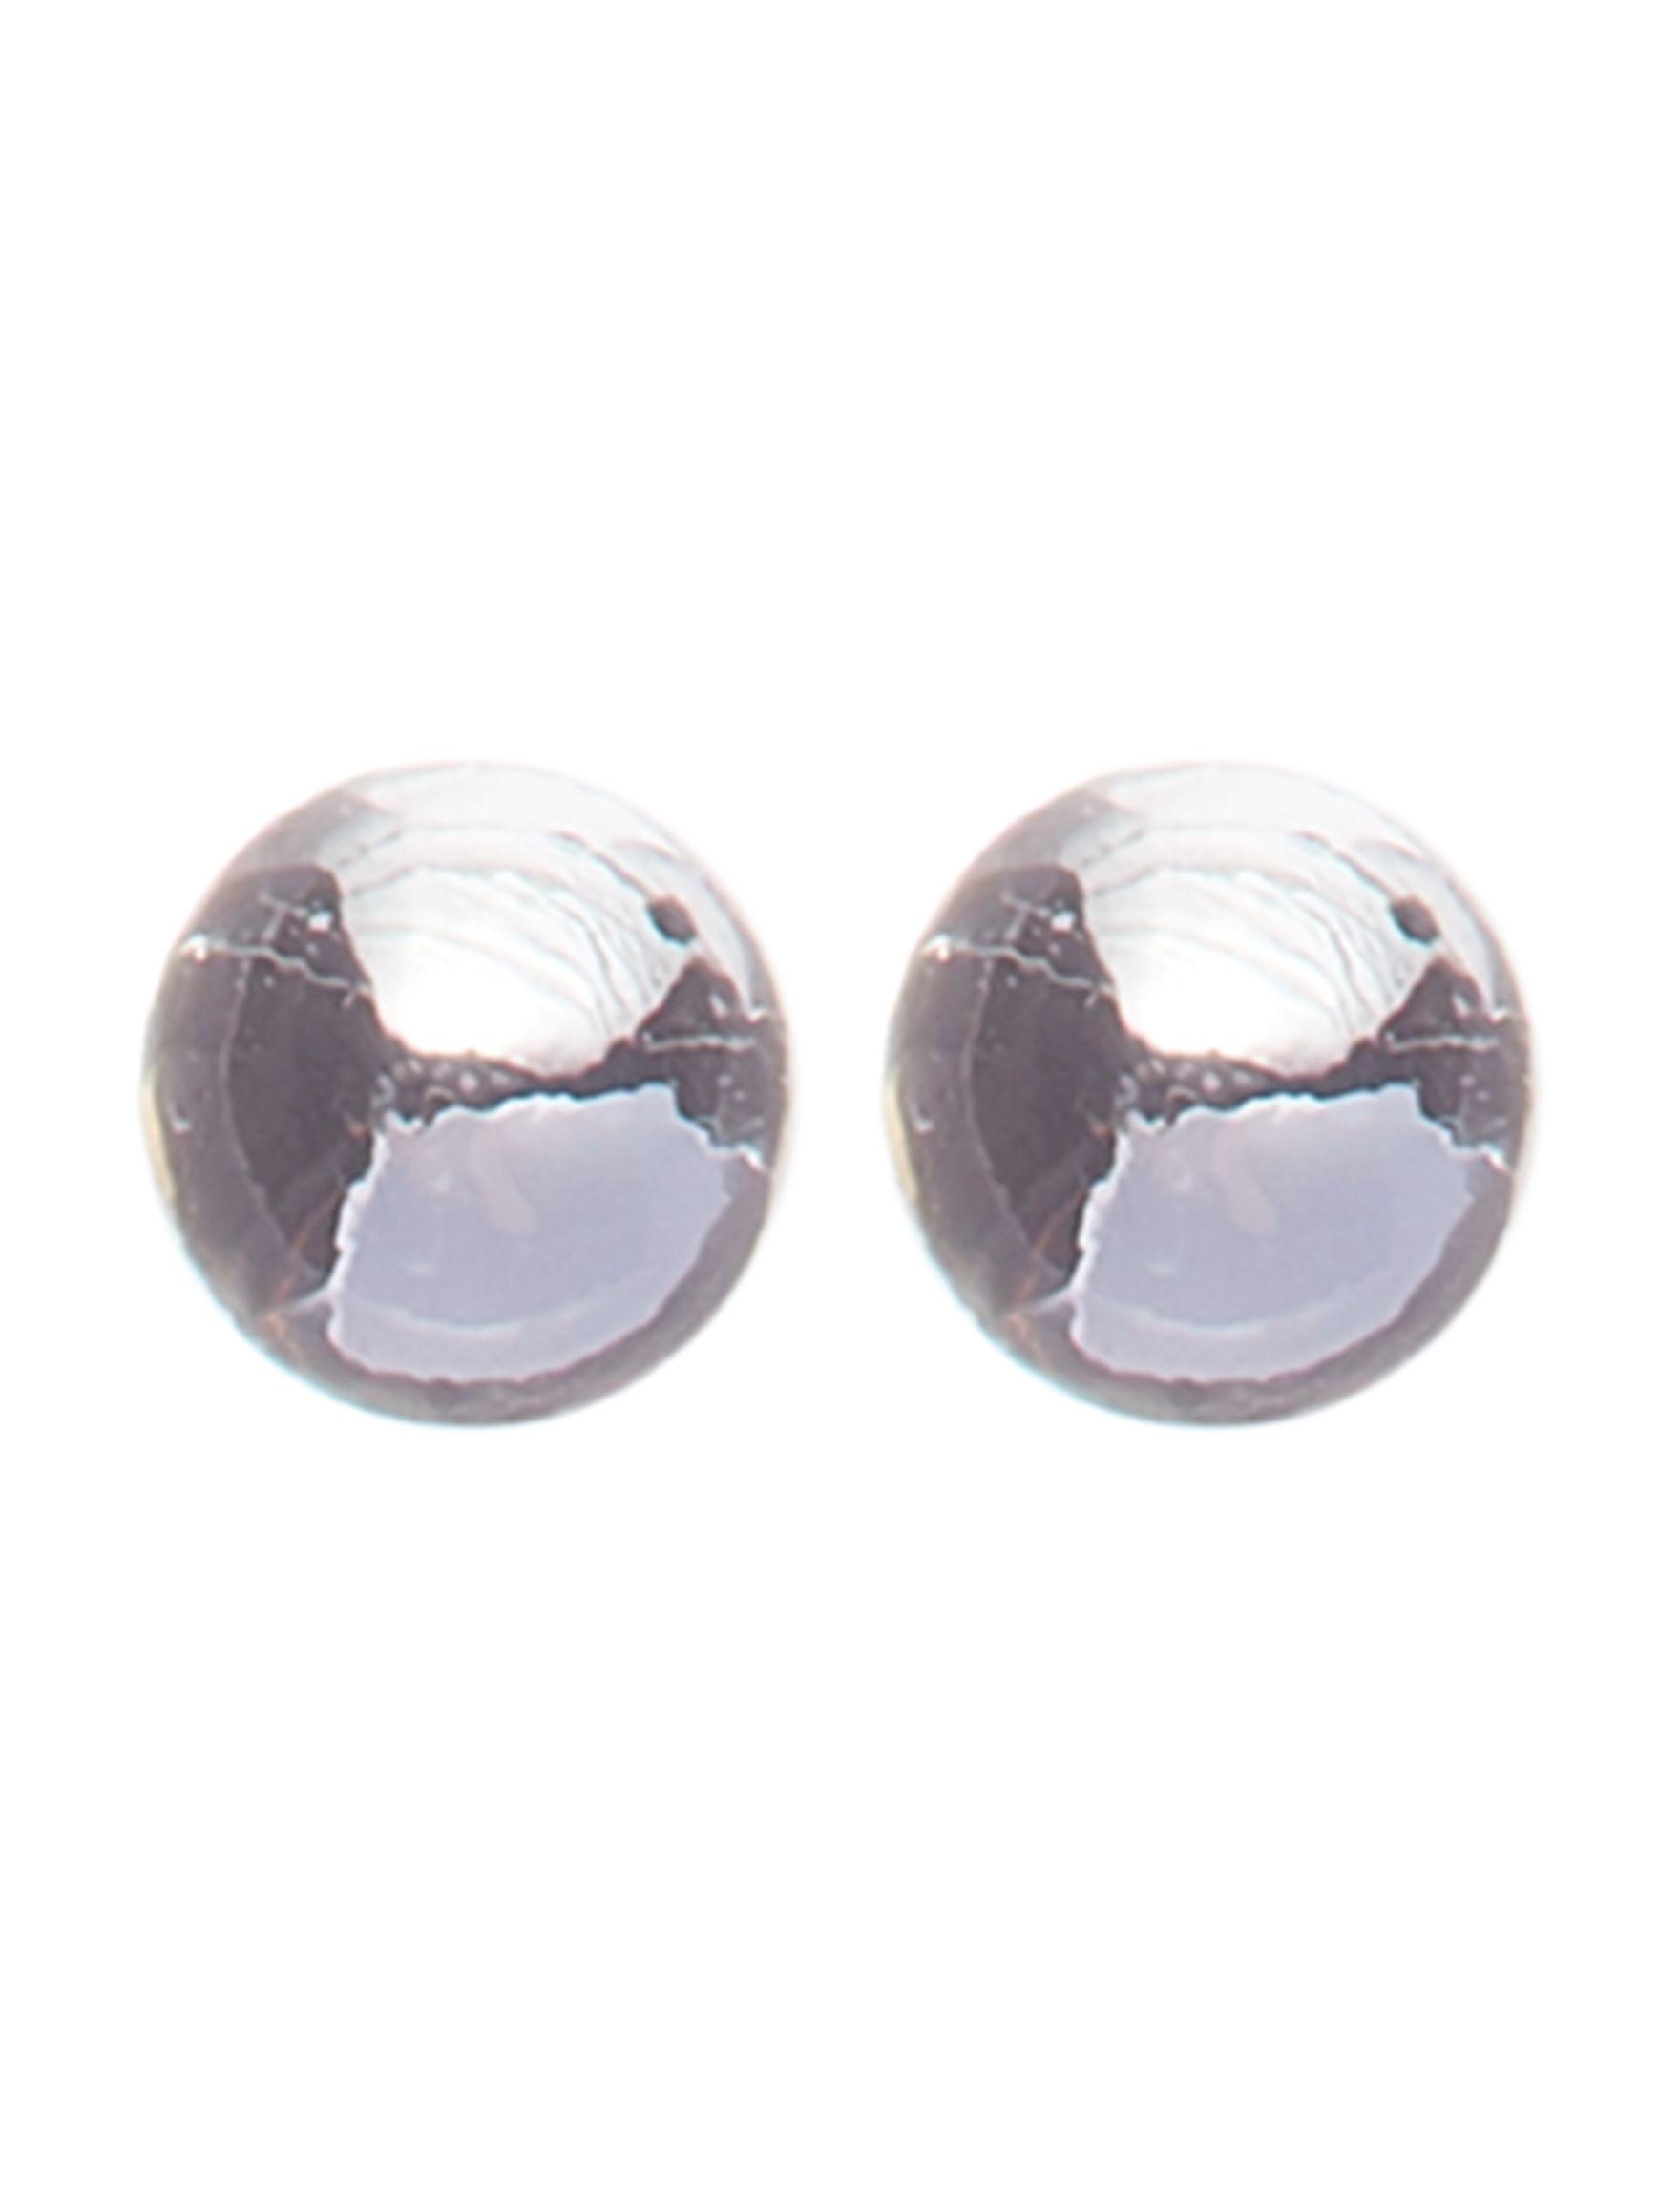 Napier Silver Studs Earrings Fashion Jewelry